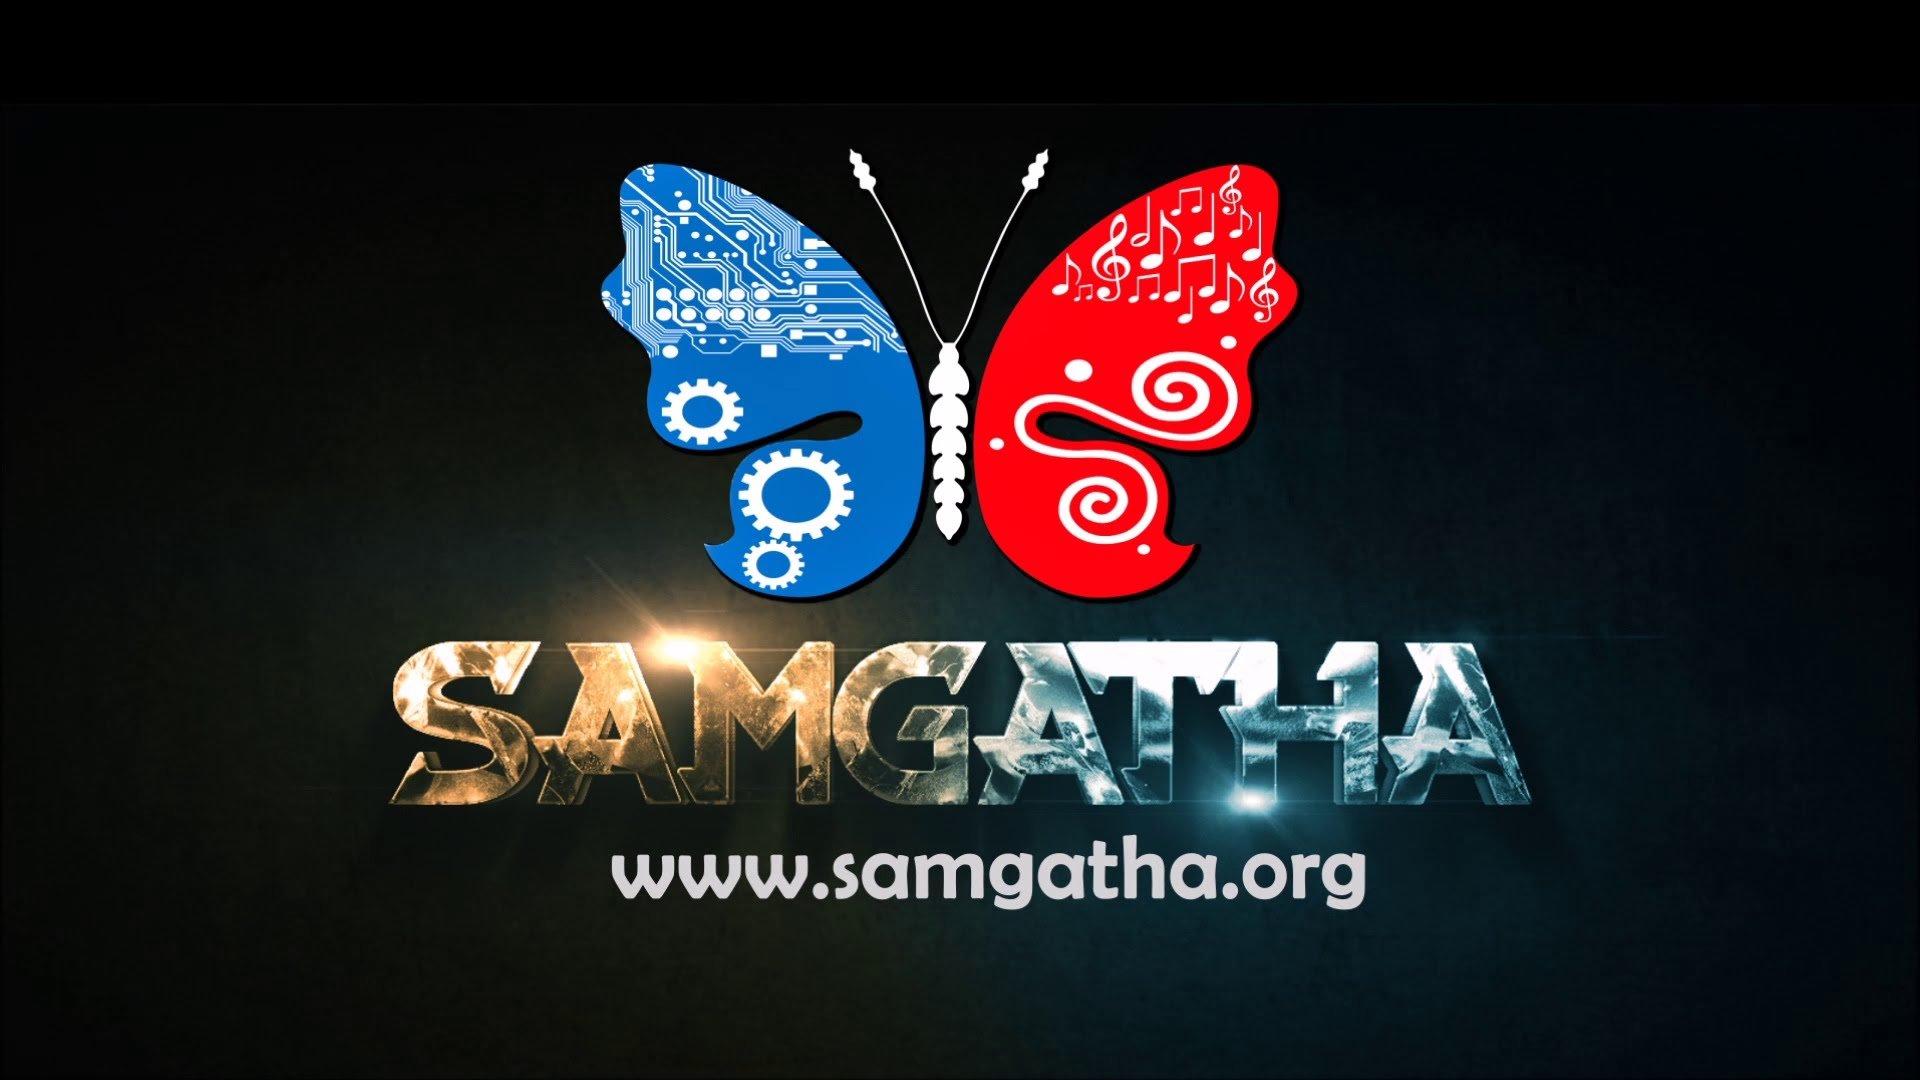 SAMGATHA 2016 logo